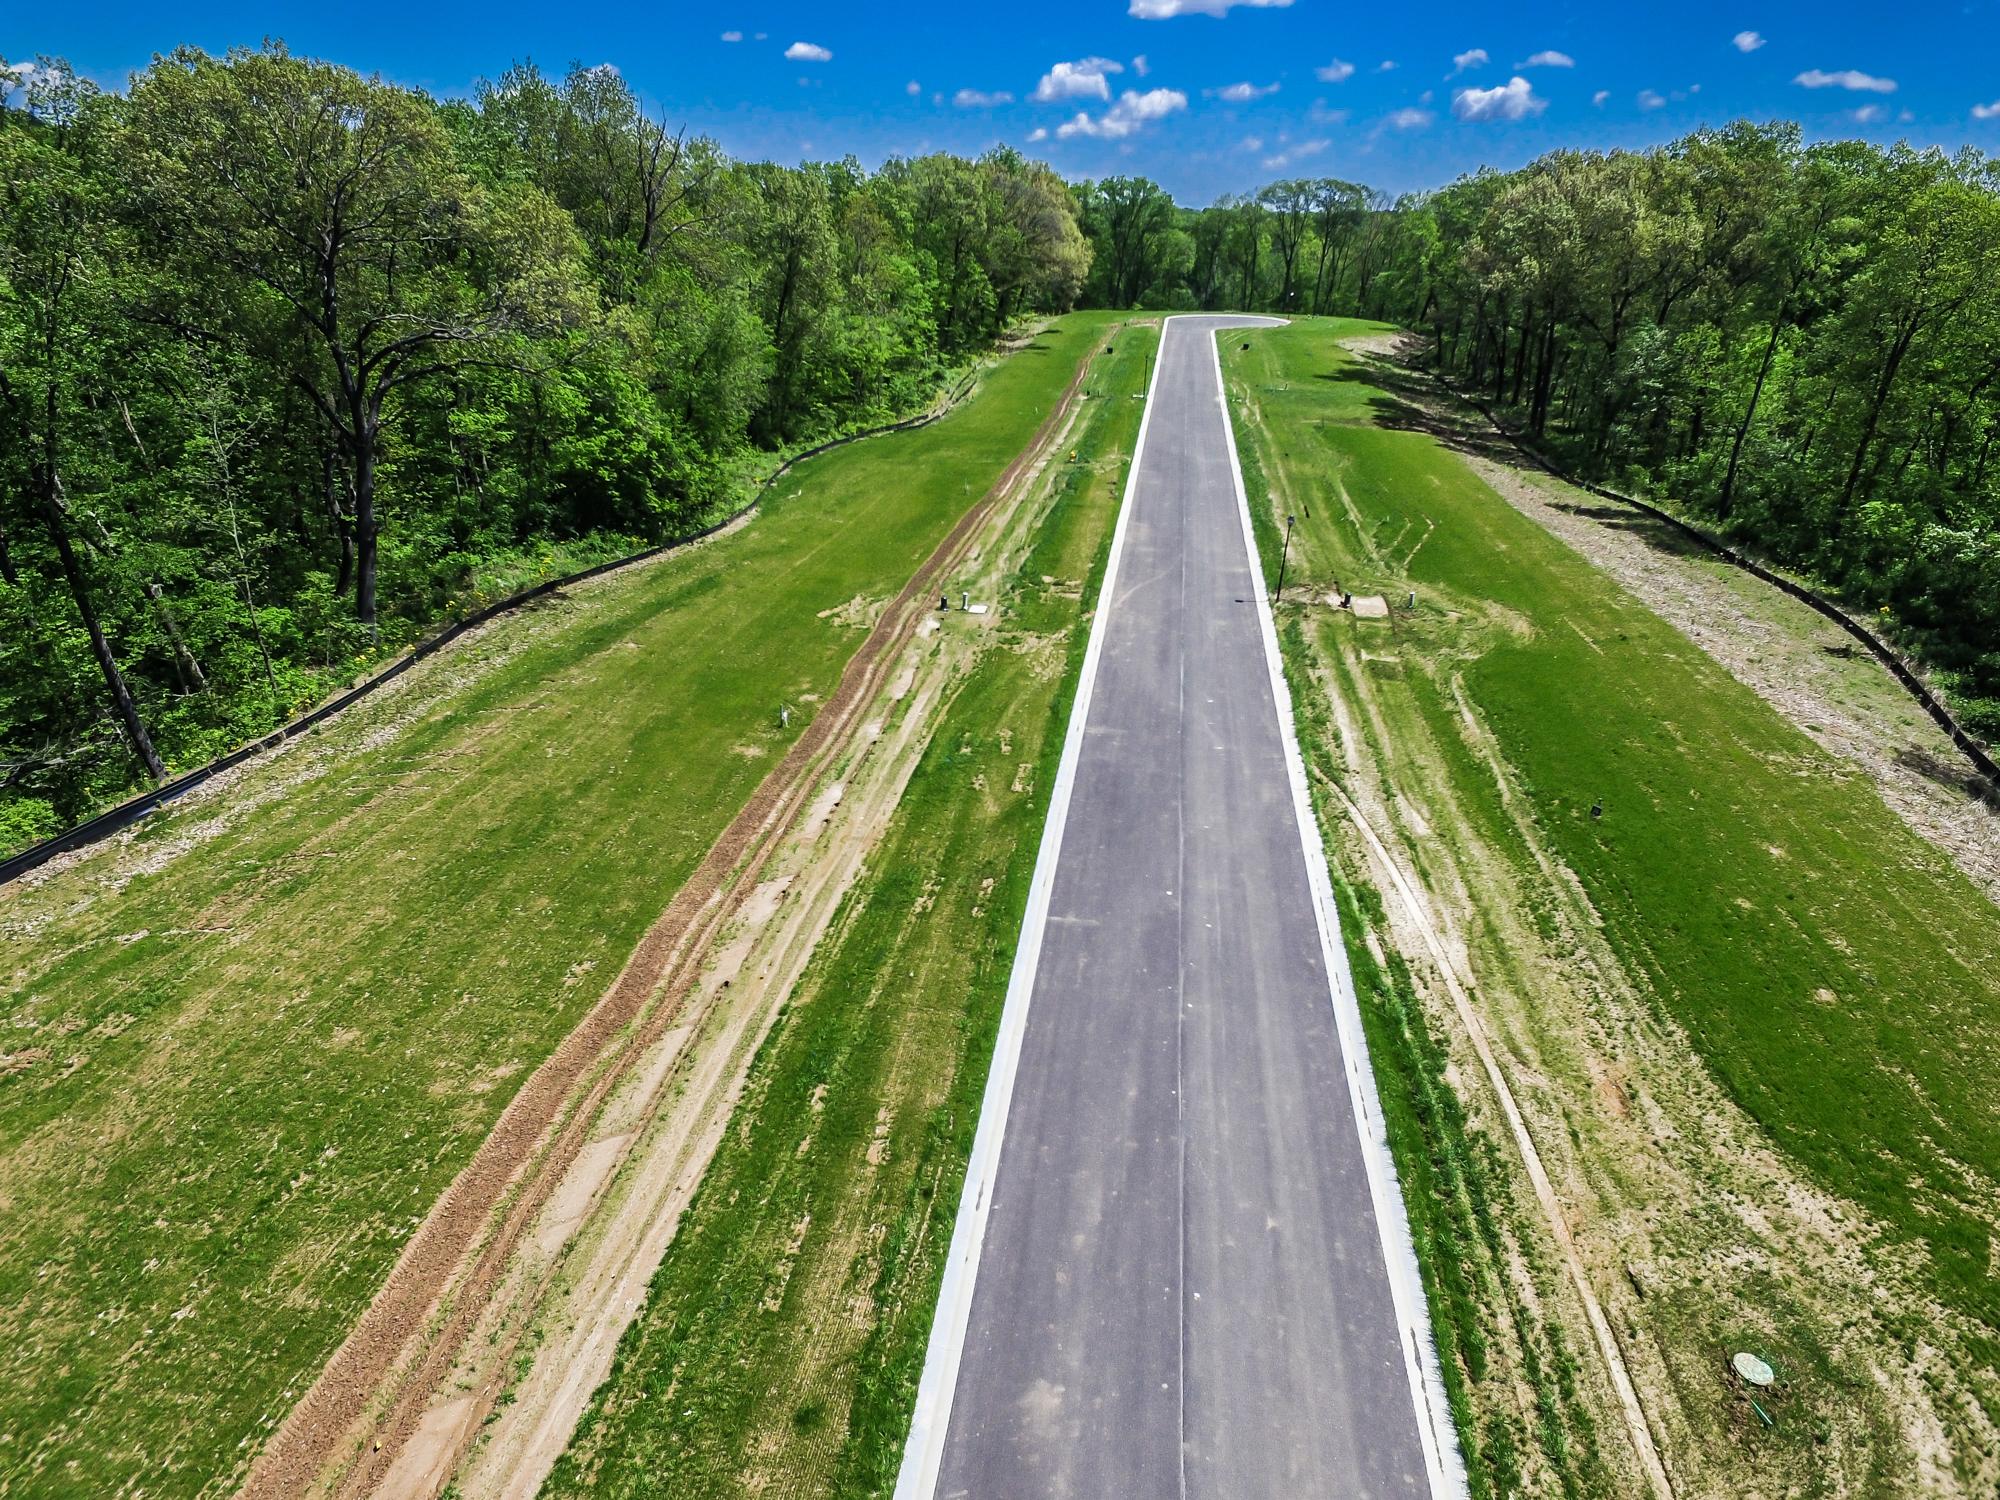 Bethel_Ridge_Farms_O'Fallon_Illinois_Aerials_Progress_5.3.17-6.jpg